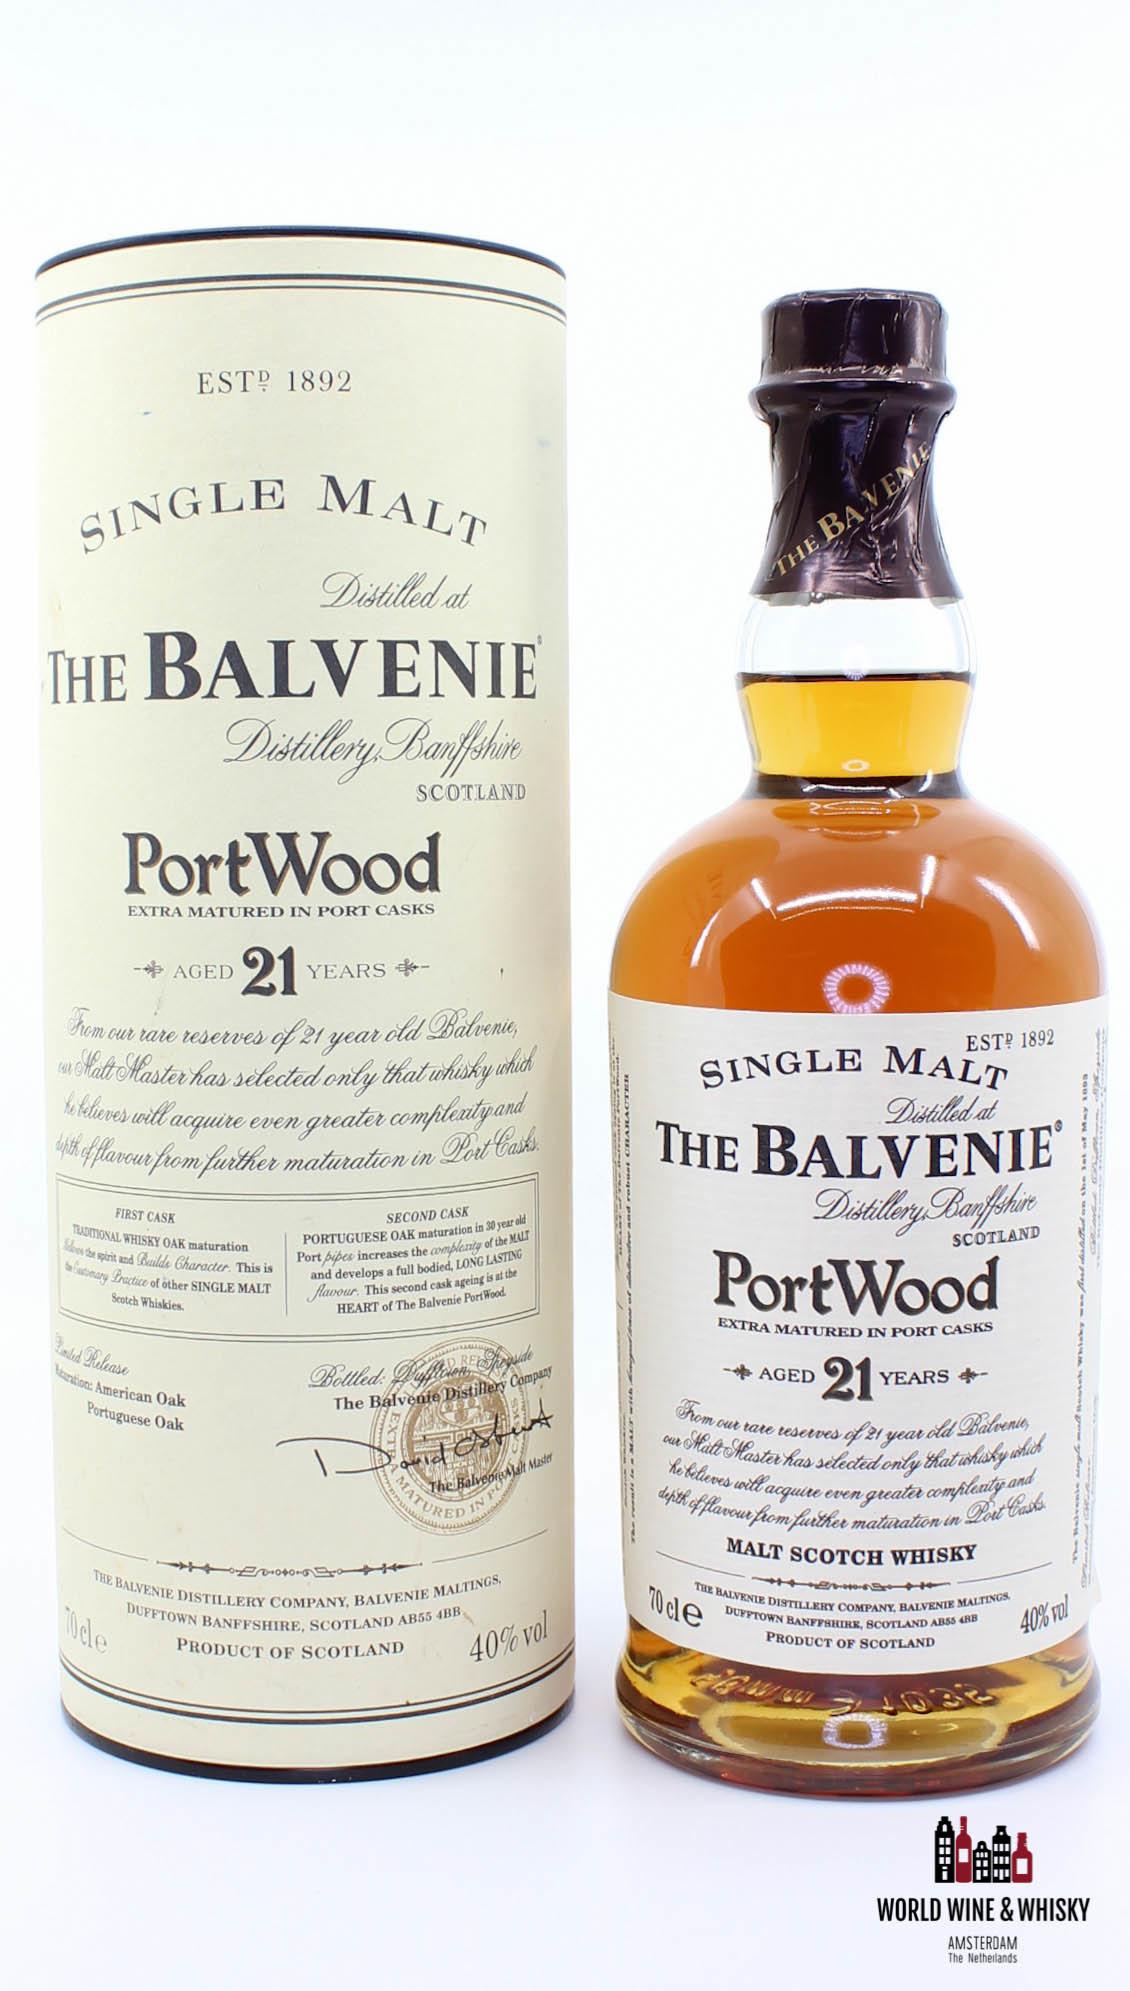 Balvenie The Balvenie 21 Years Old PortWood (Port Casks) 40%